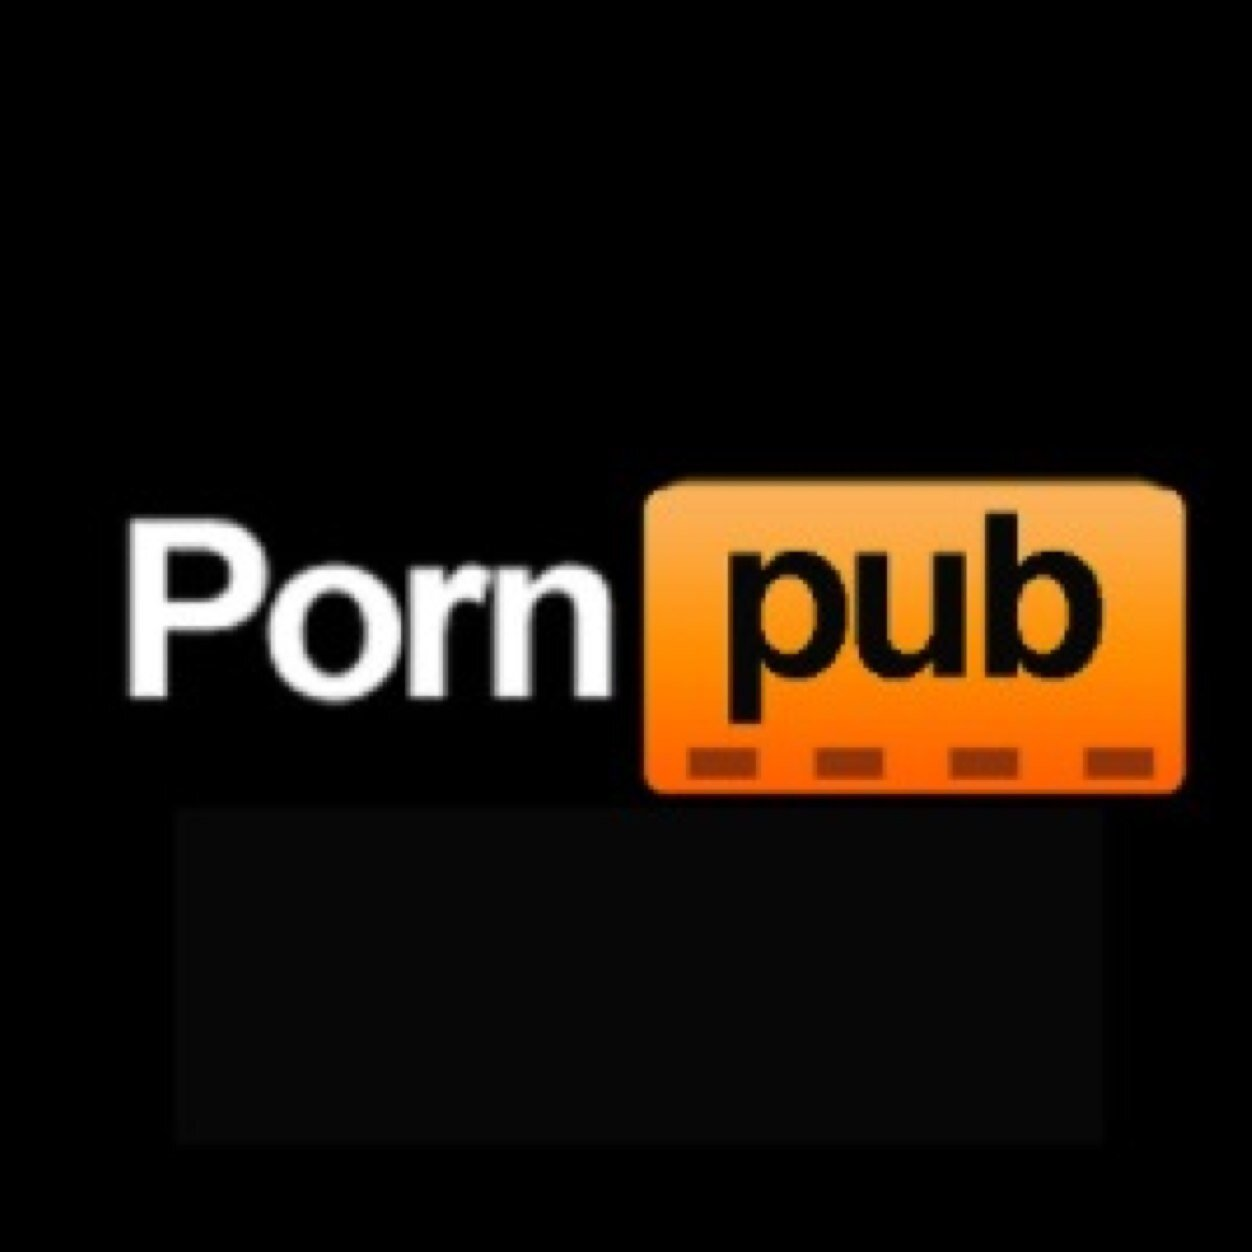 Pornpub